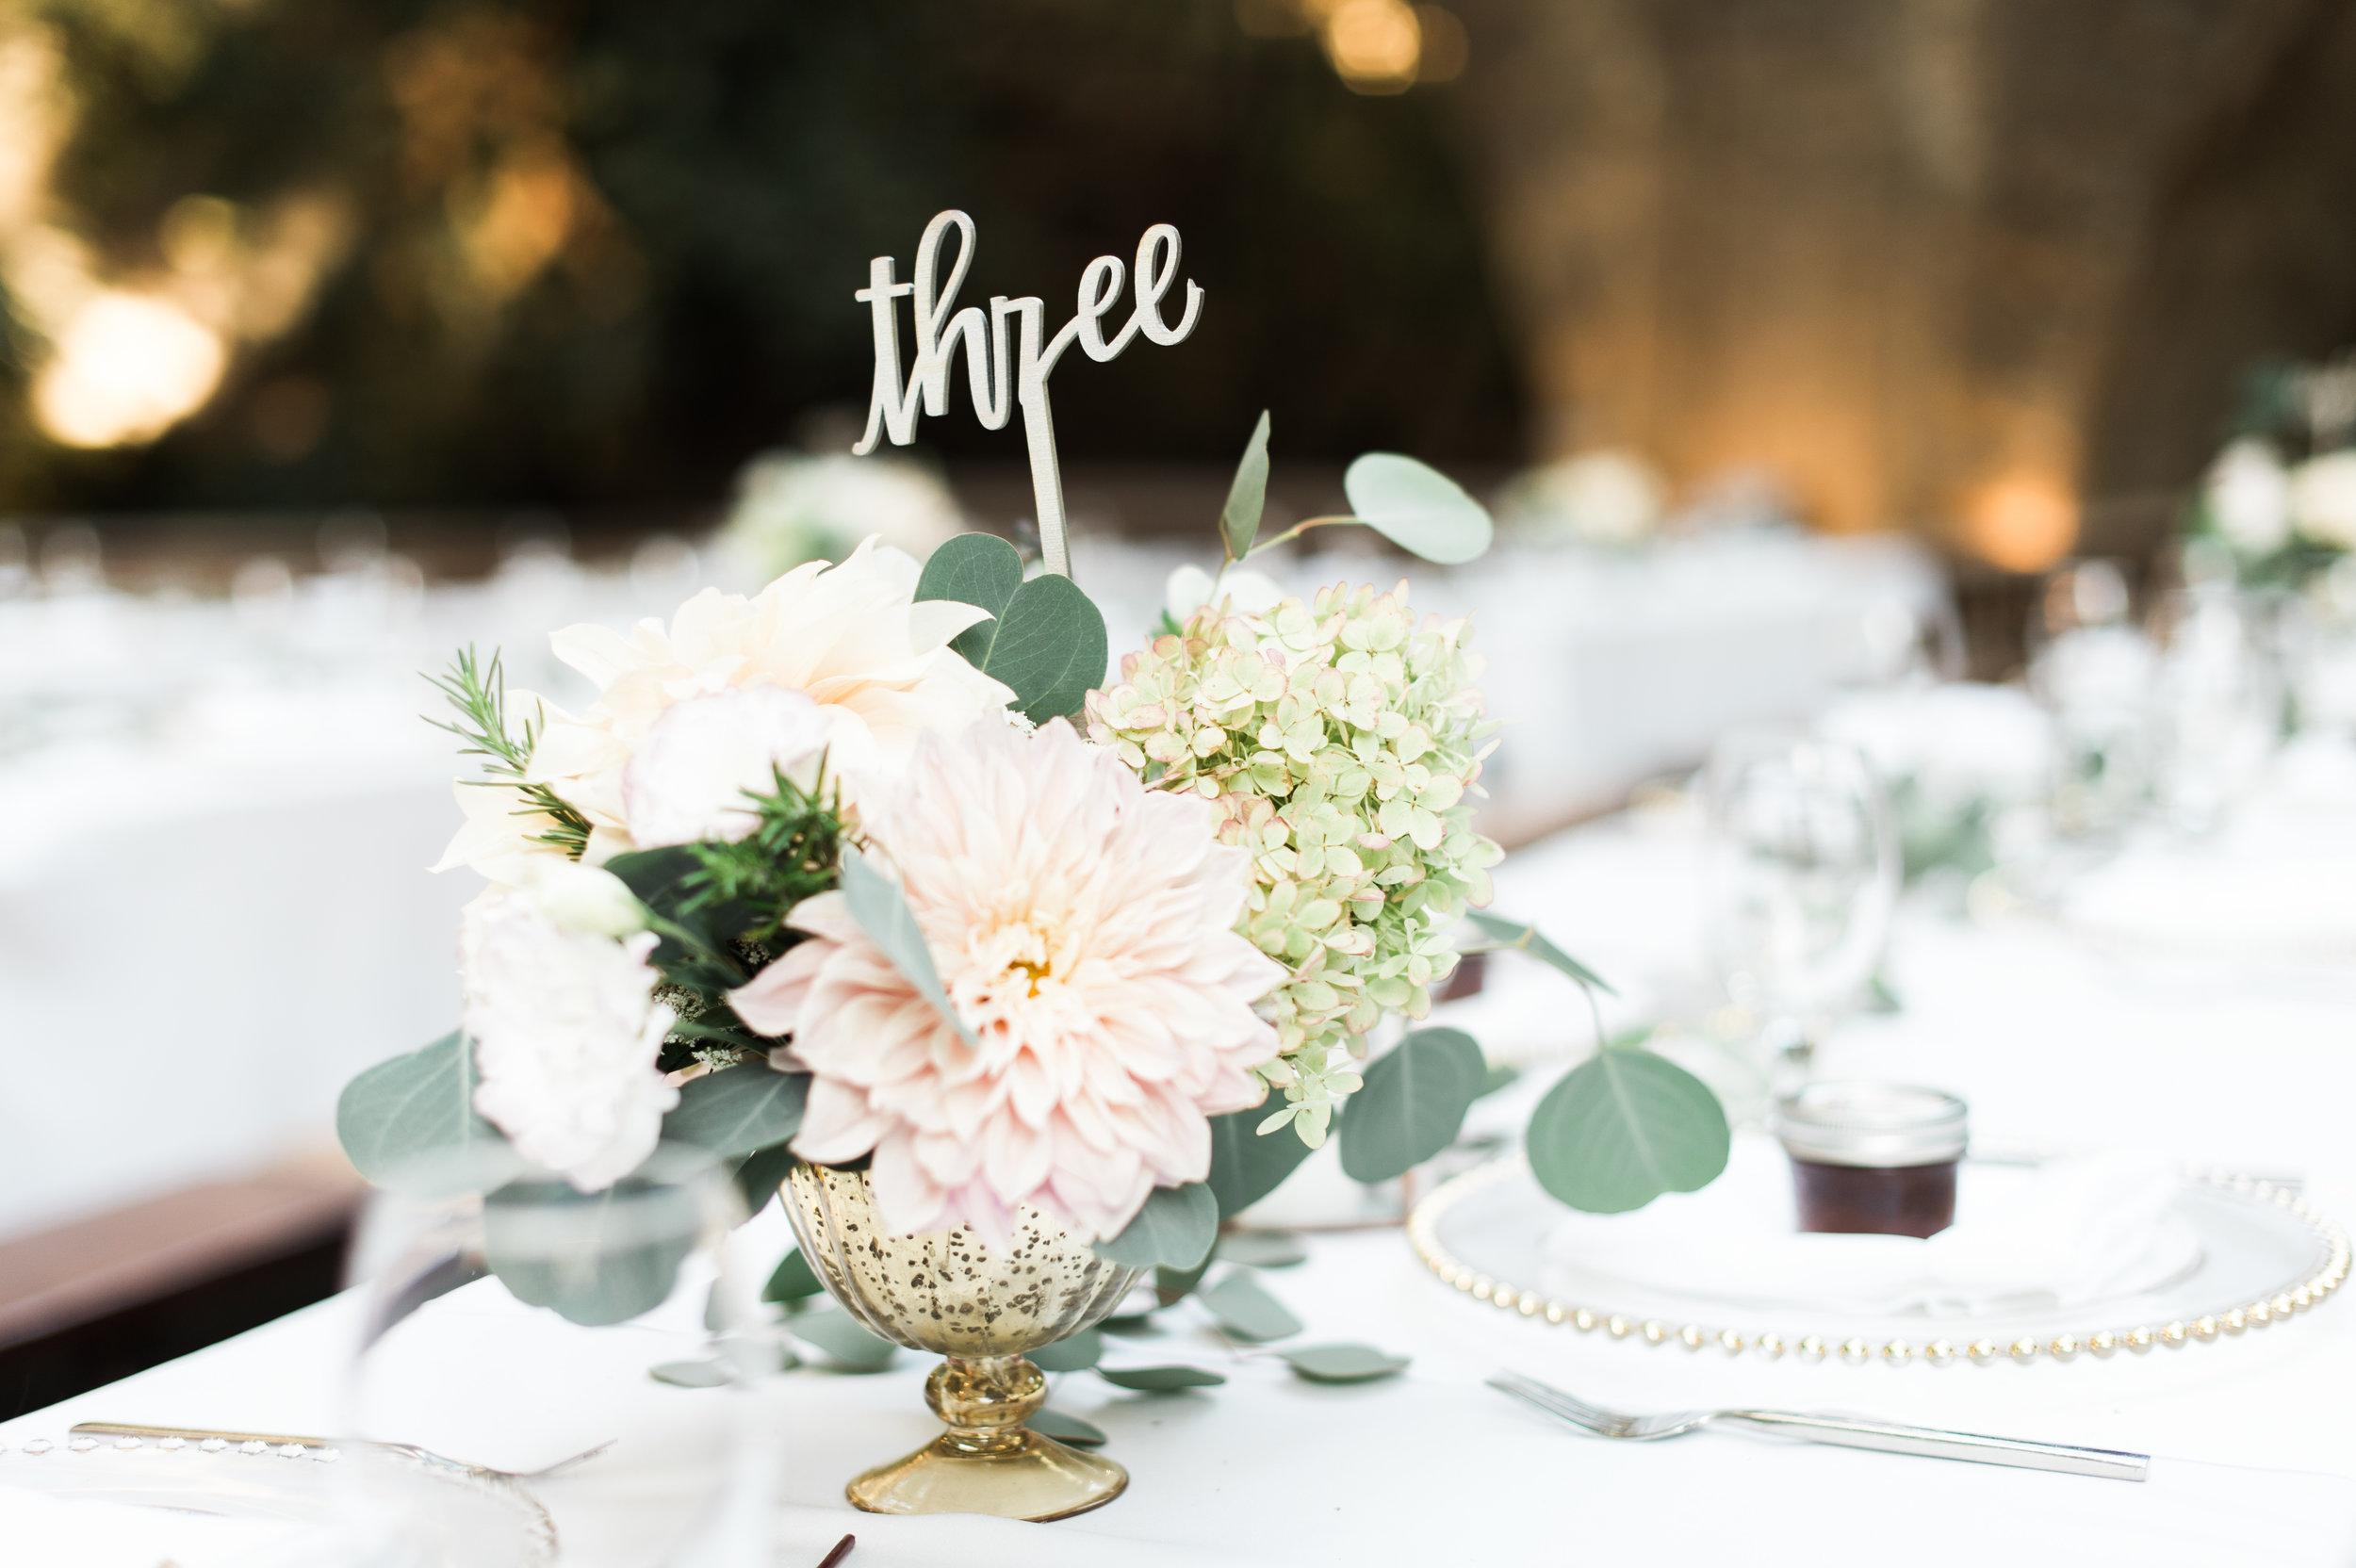 saratoga_springs_wedding_flowers.jpg